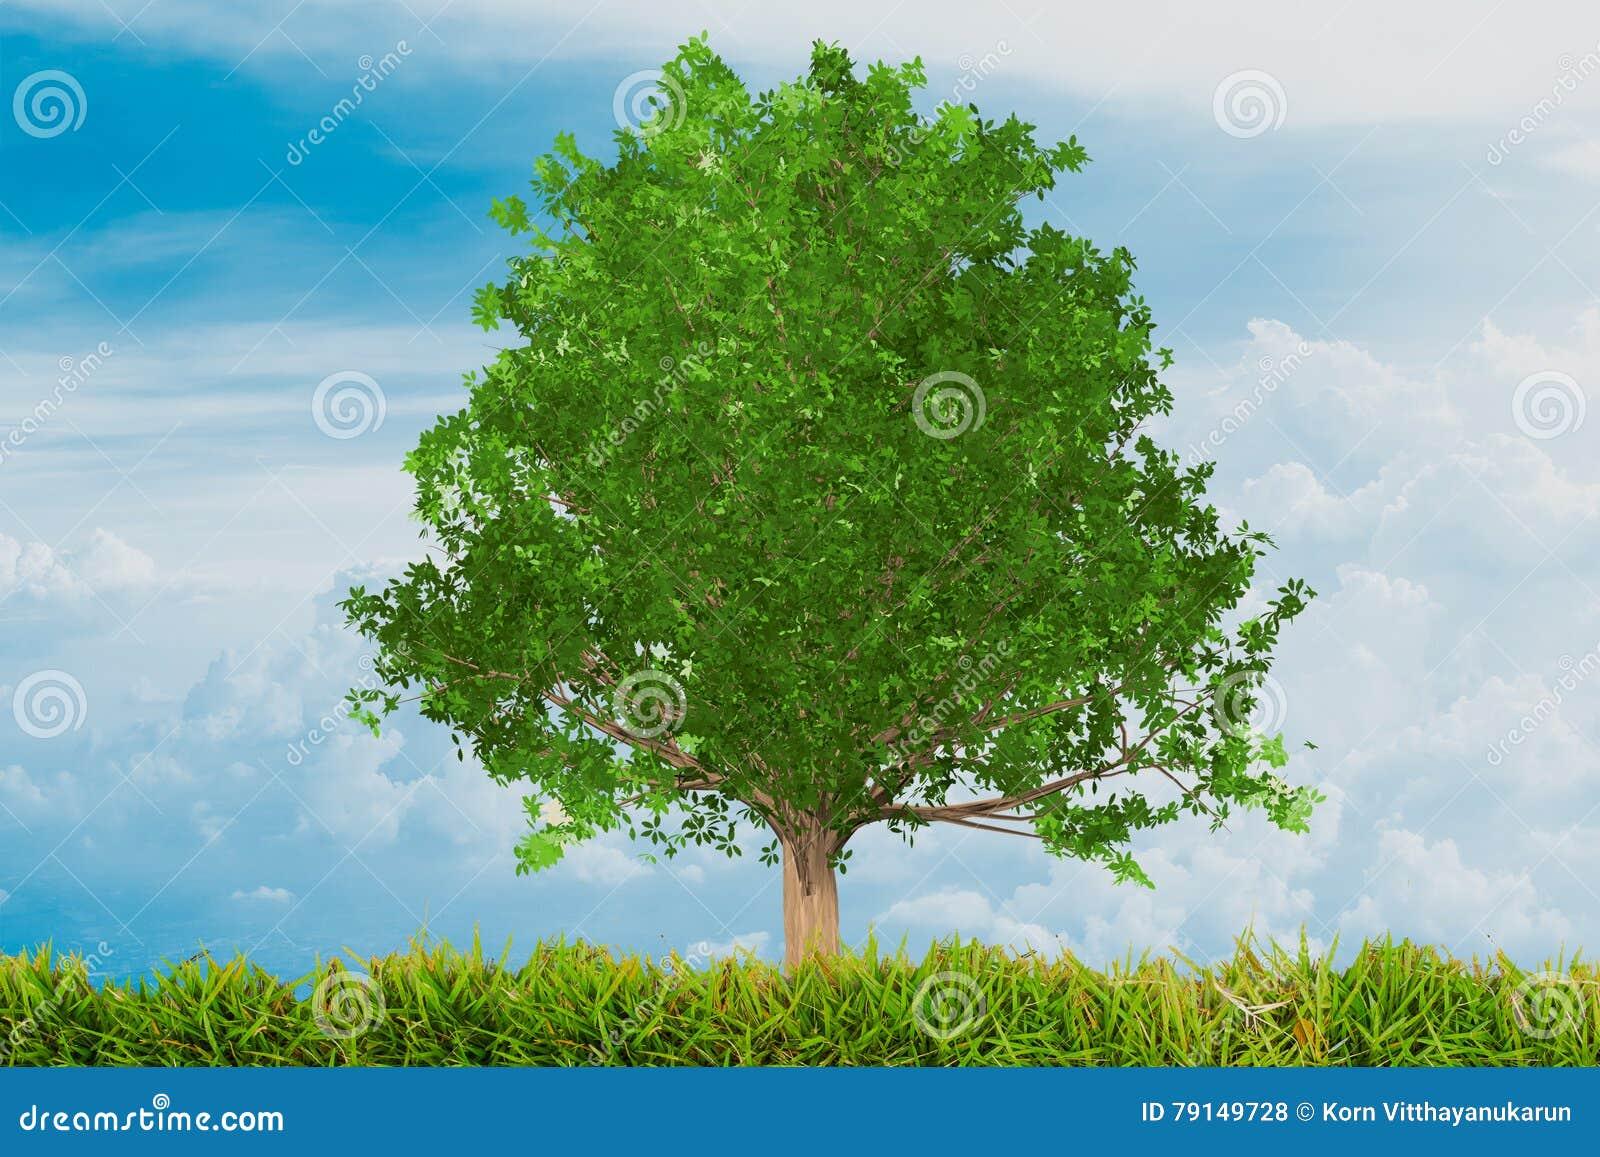 oak forest jewish single women Oak forest's best 100% free online dating site meet loads of available single women in oak forest with mingle2's oak forest dating services find a girlfriend or lover in oak forest, or.